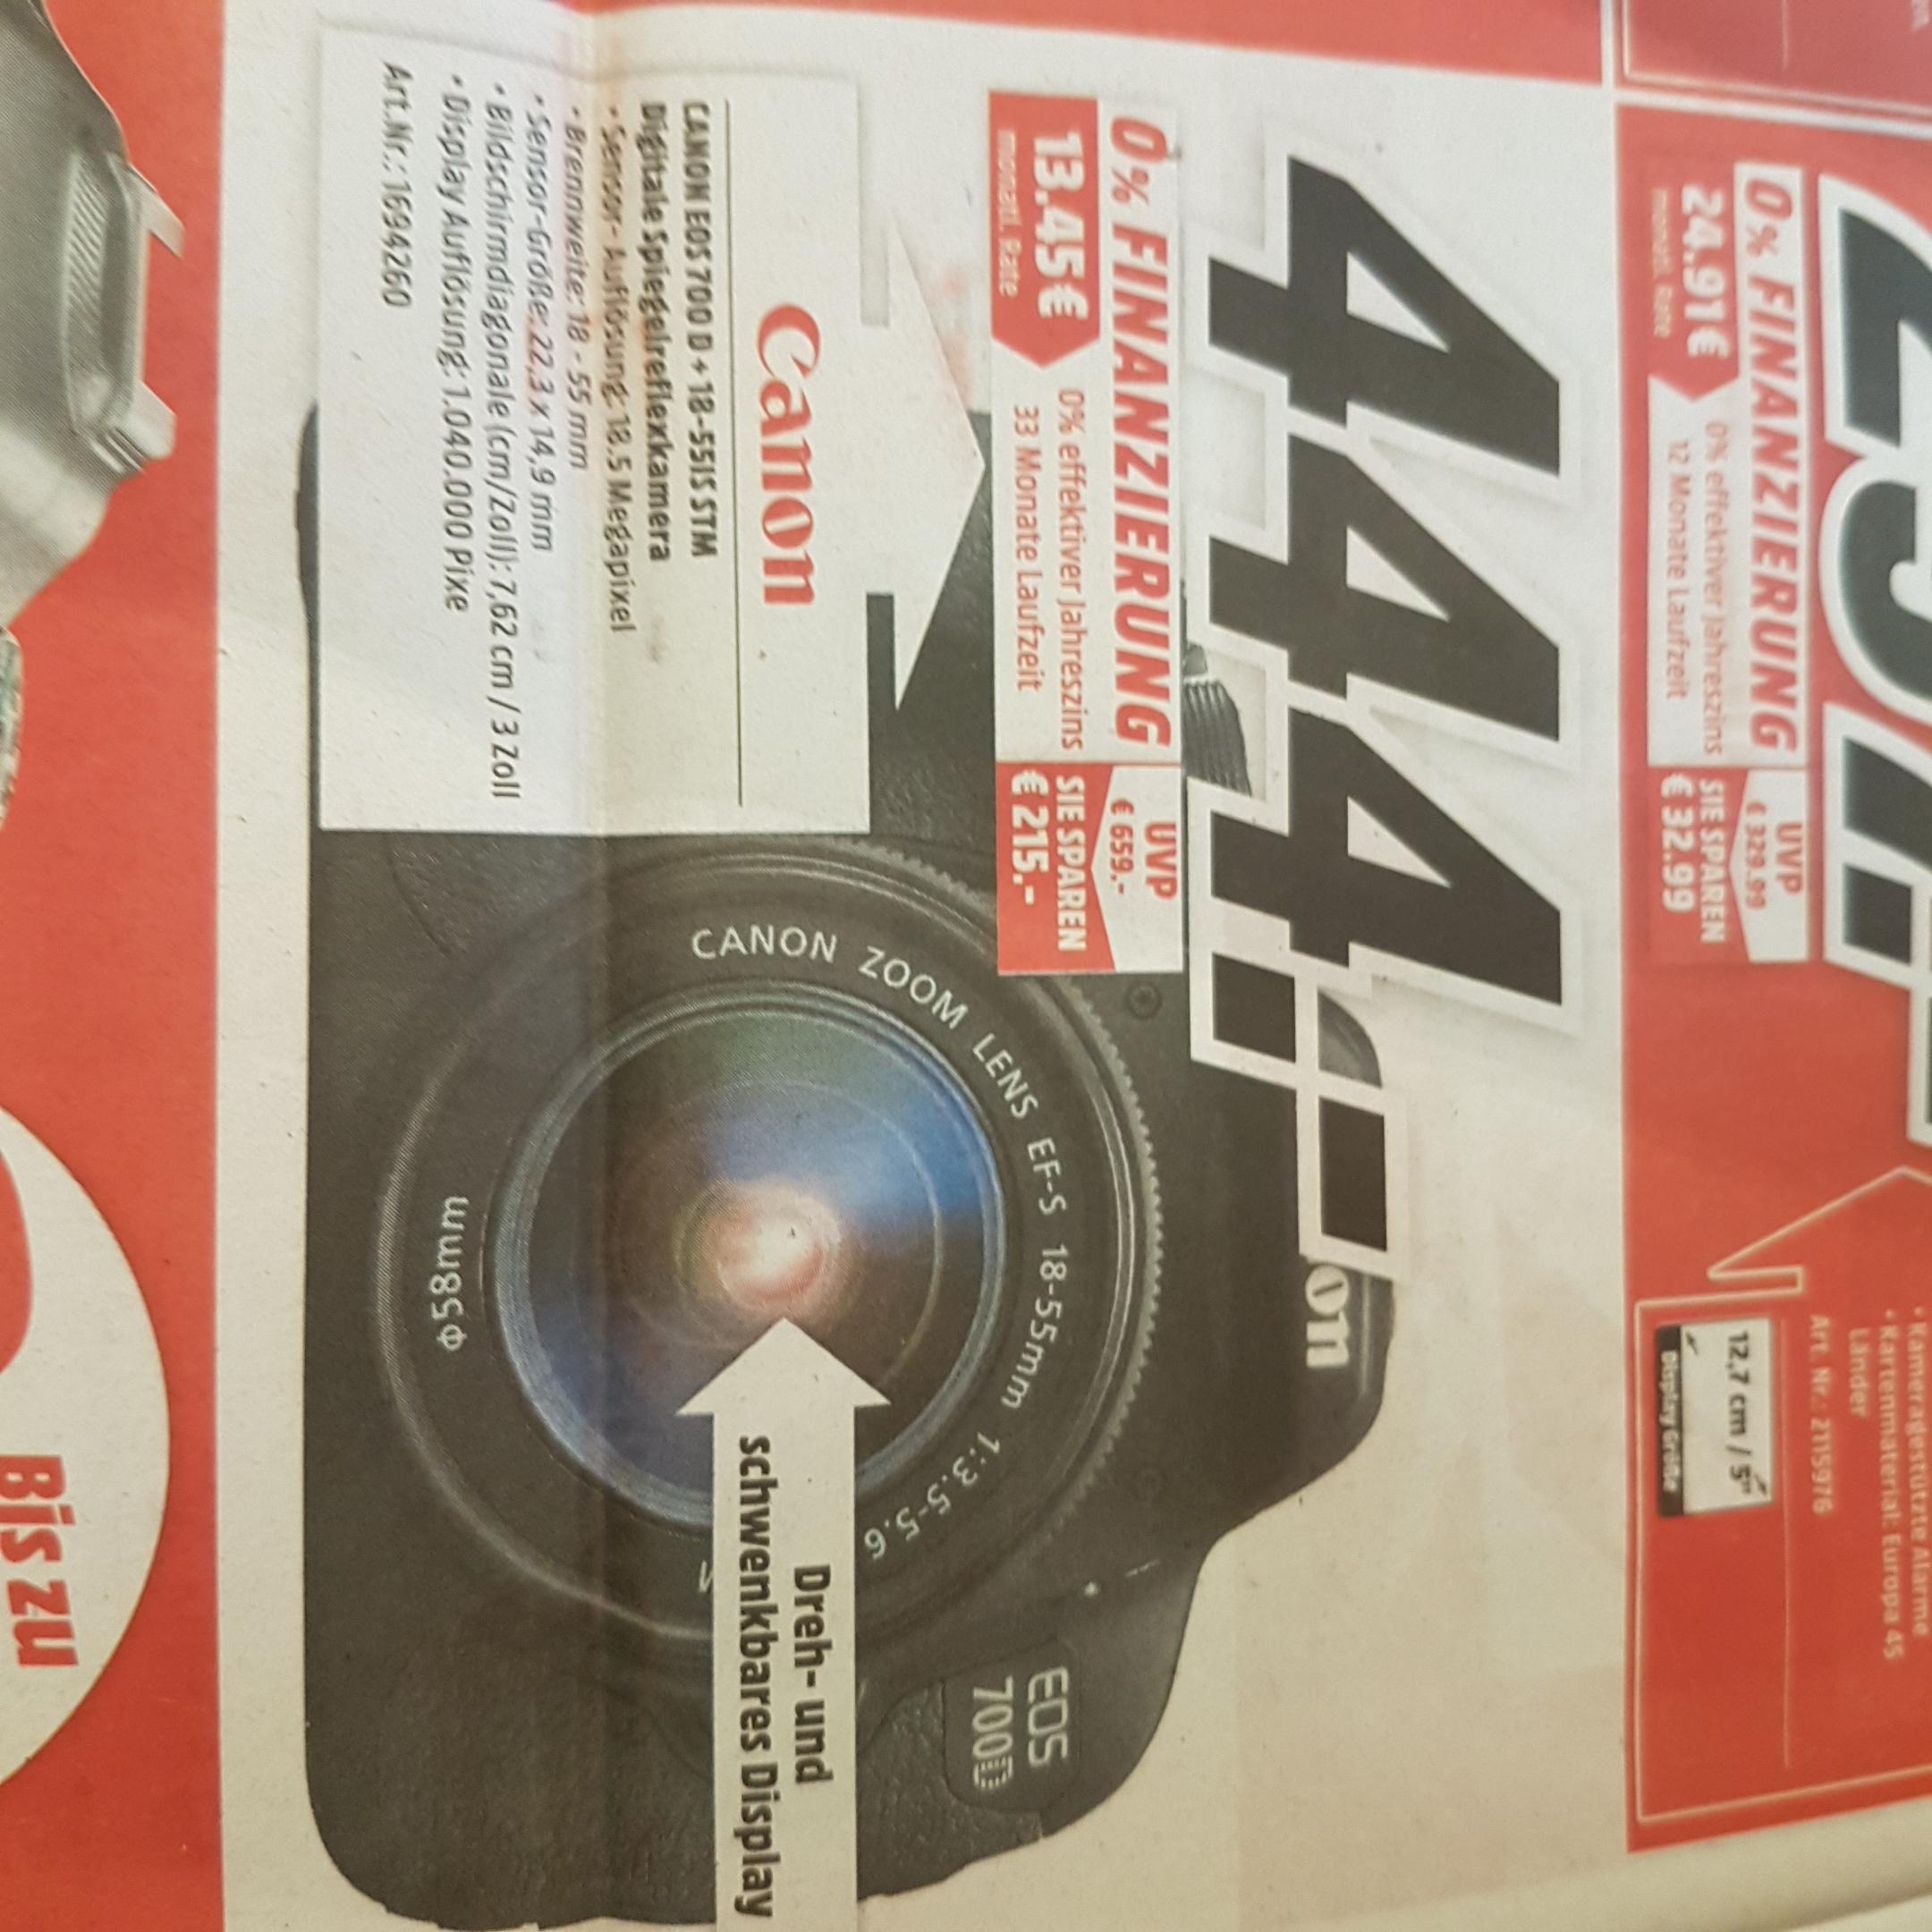 (lokal Karlsruhe) CANON EOS 700D inkl. 18-55IS STM Objektiv für 444€